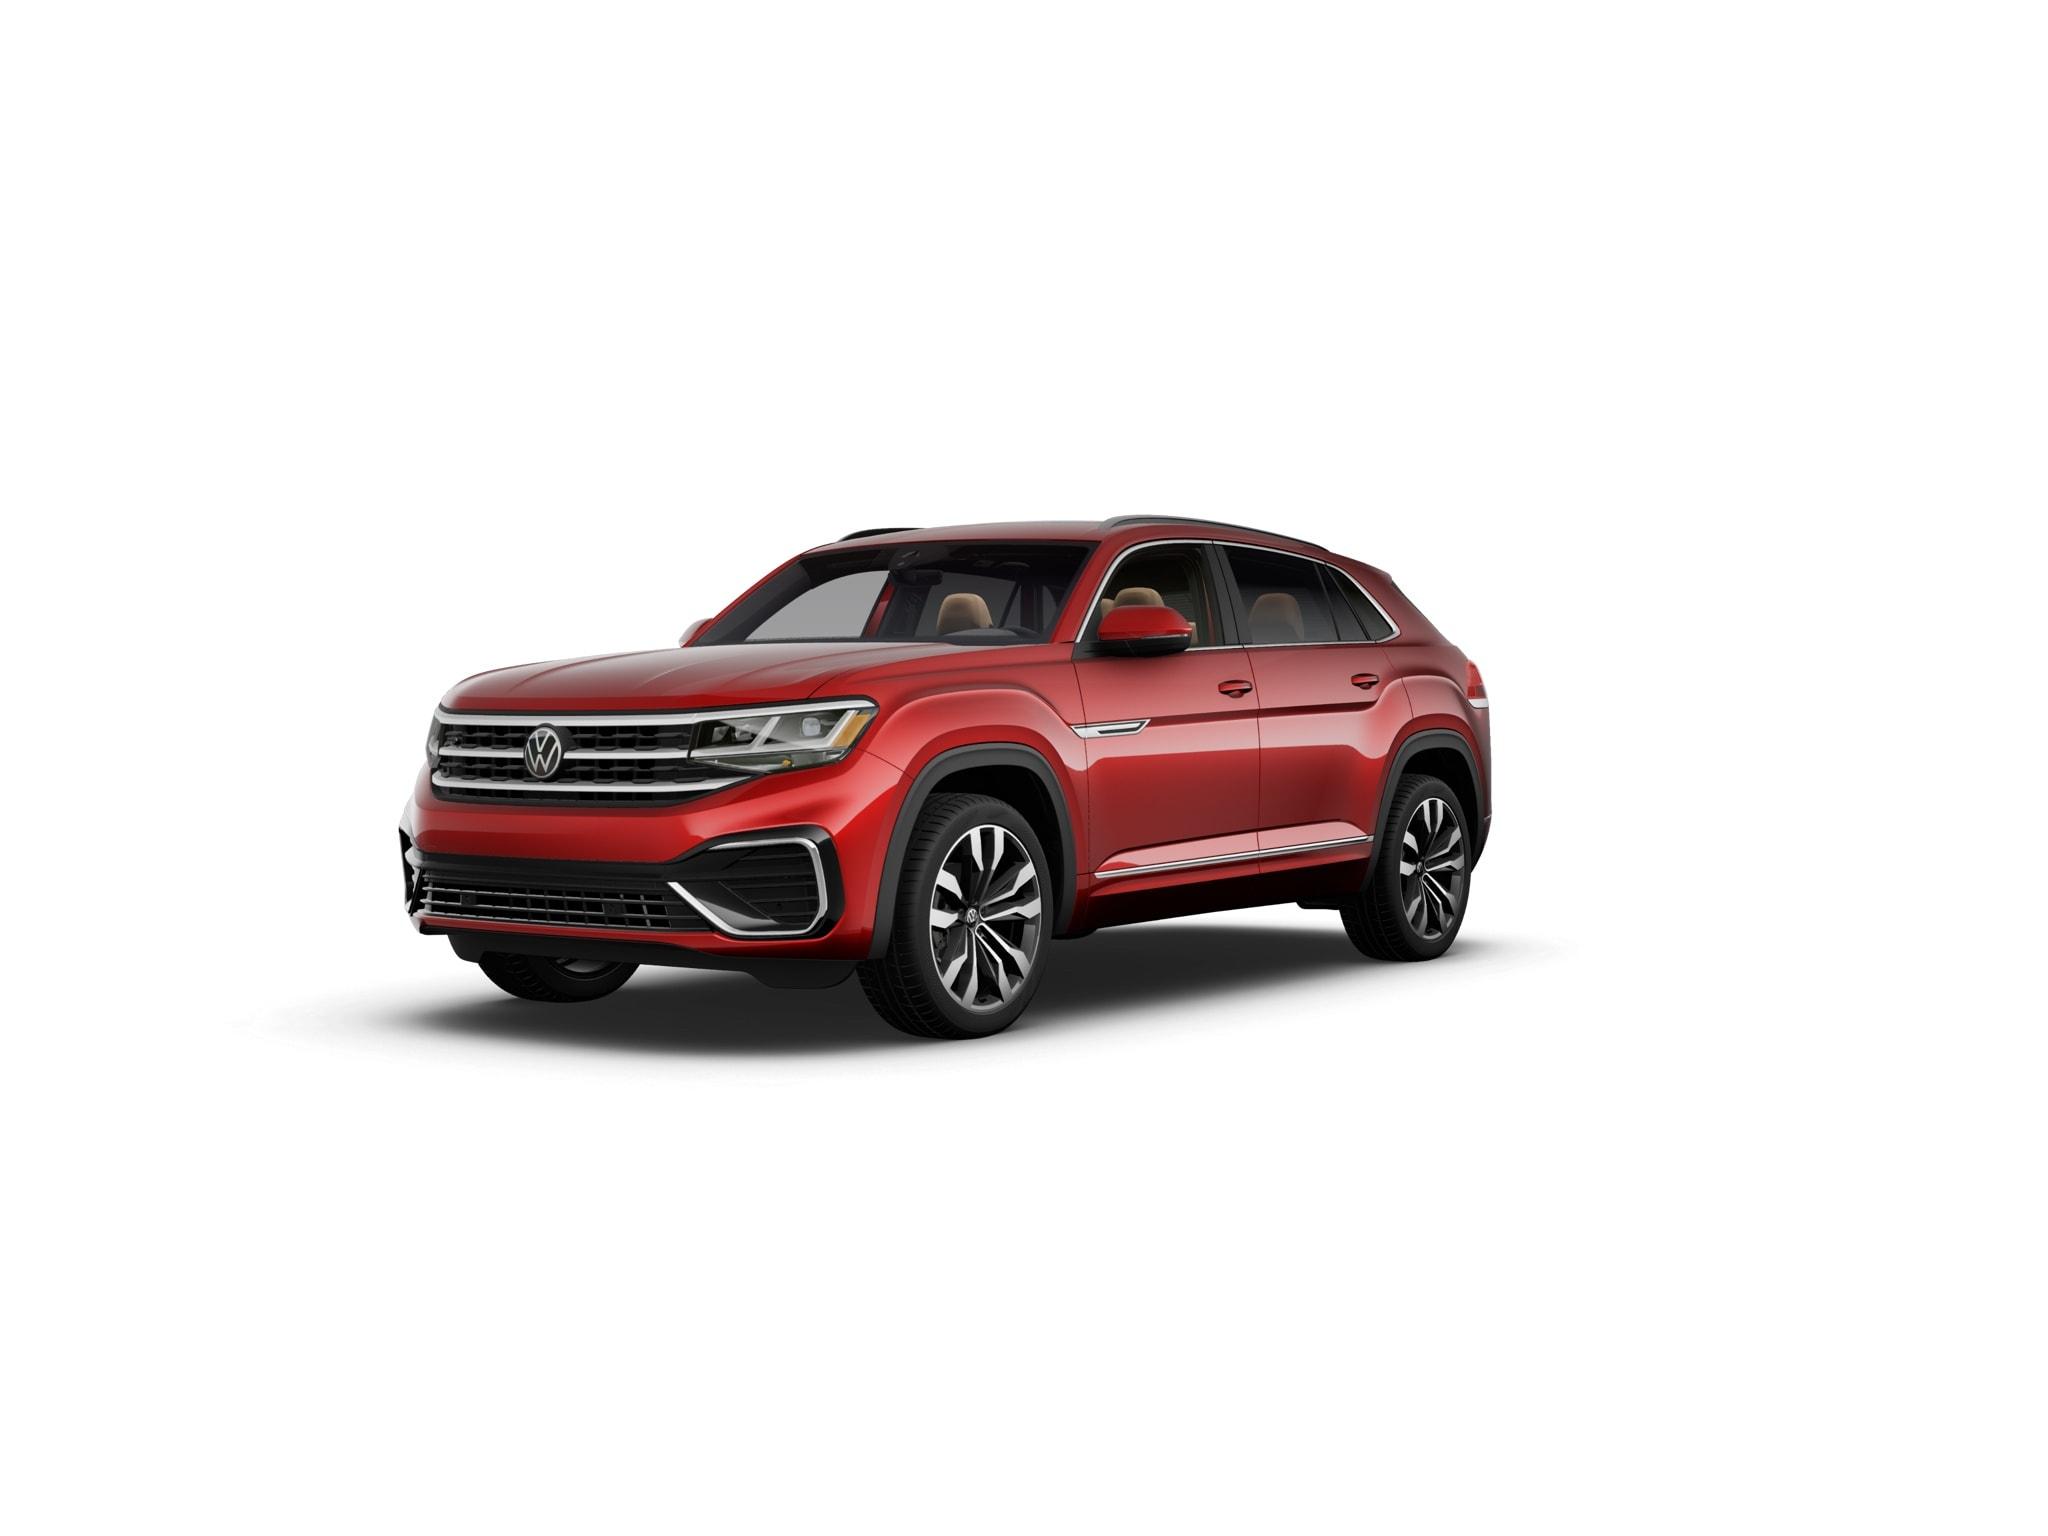 2020 Volkswagen Atlas Cross Sport SEL R-Line configuration